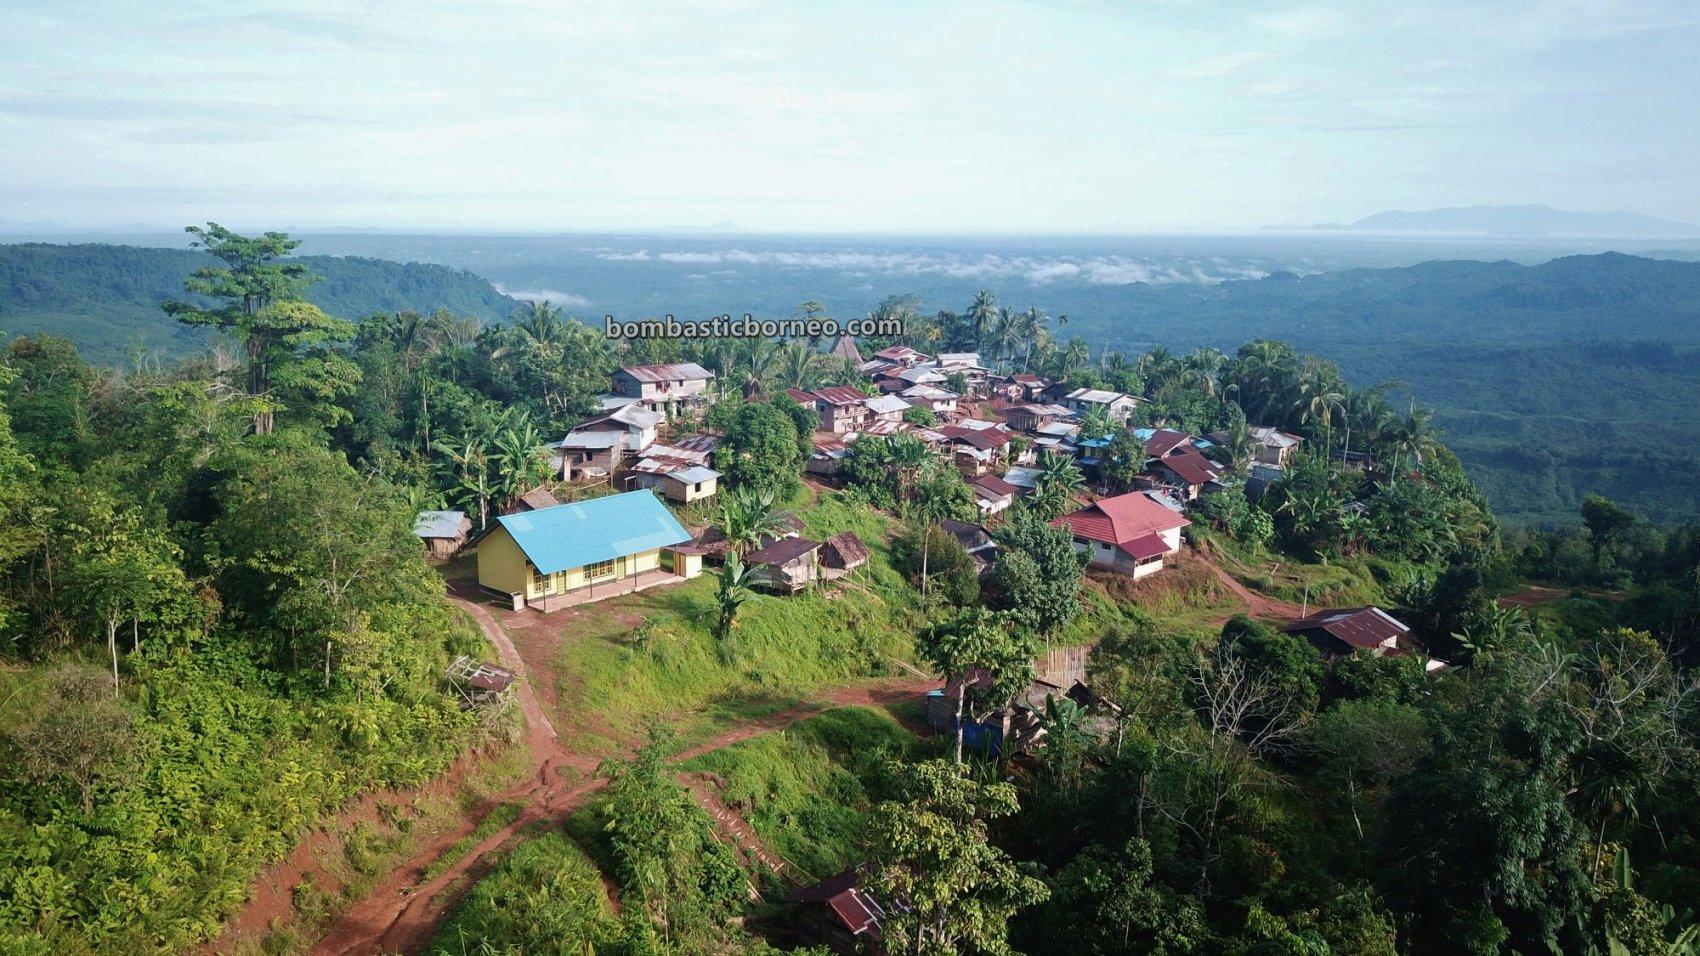 Desa Tamong, highland, adventure, Traditional, indigenous, village, destination, Indonesia, West Kalimantan, Bengkayang, native, tribe, Tourism, travel guide, Trans Border, Borneo